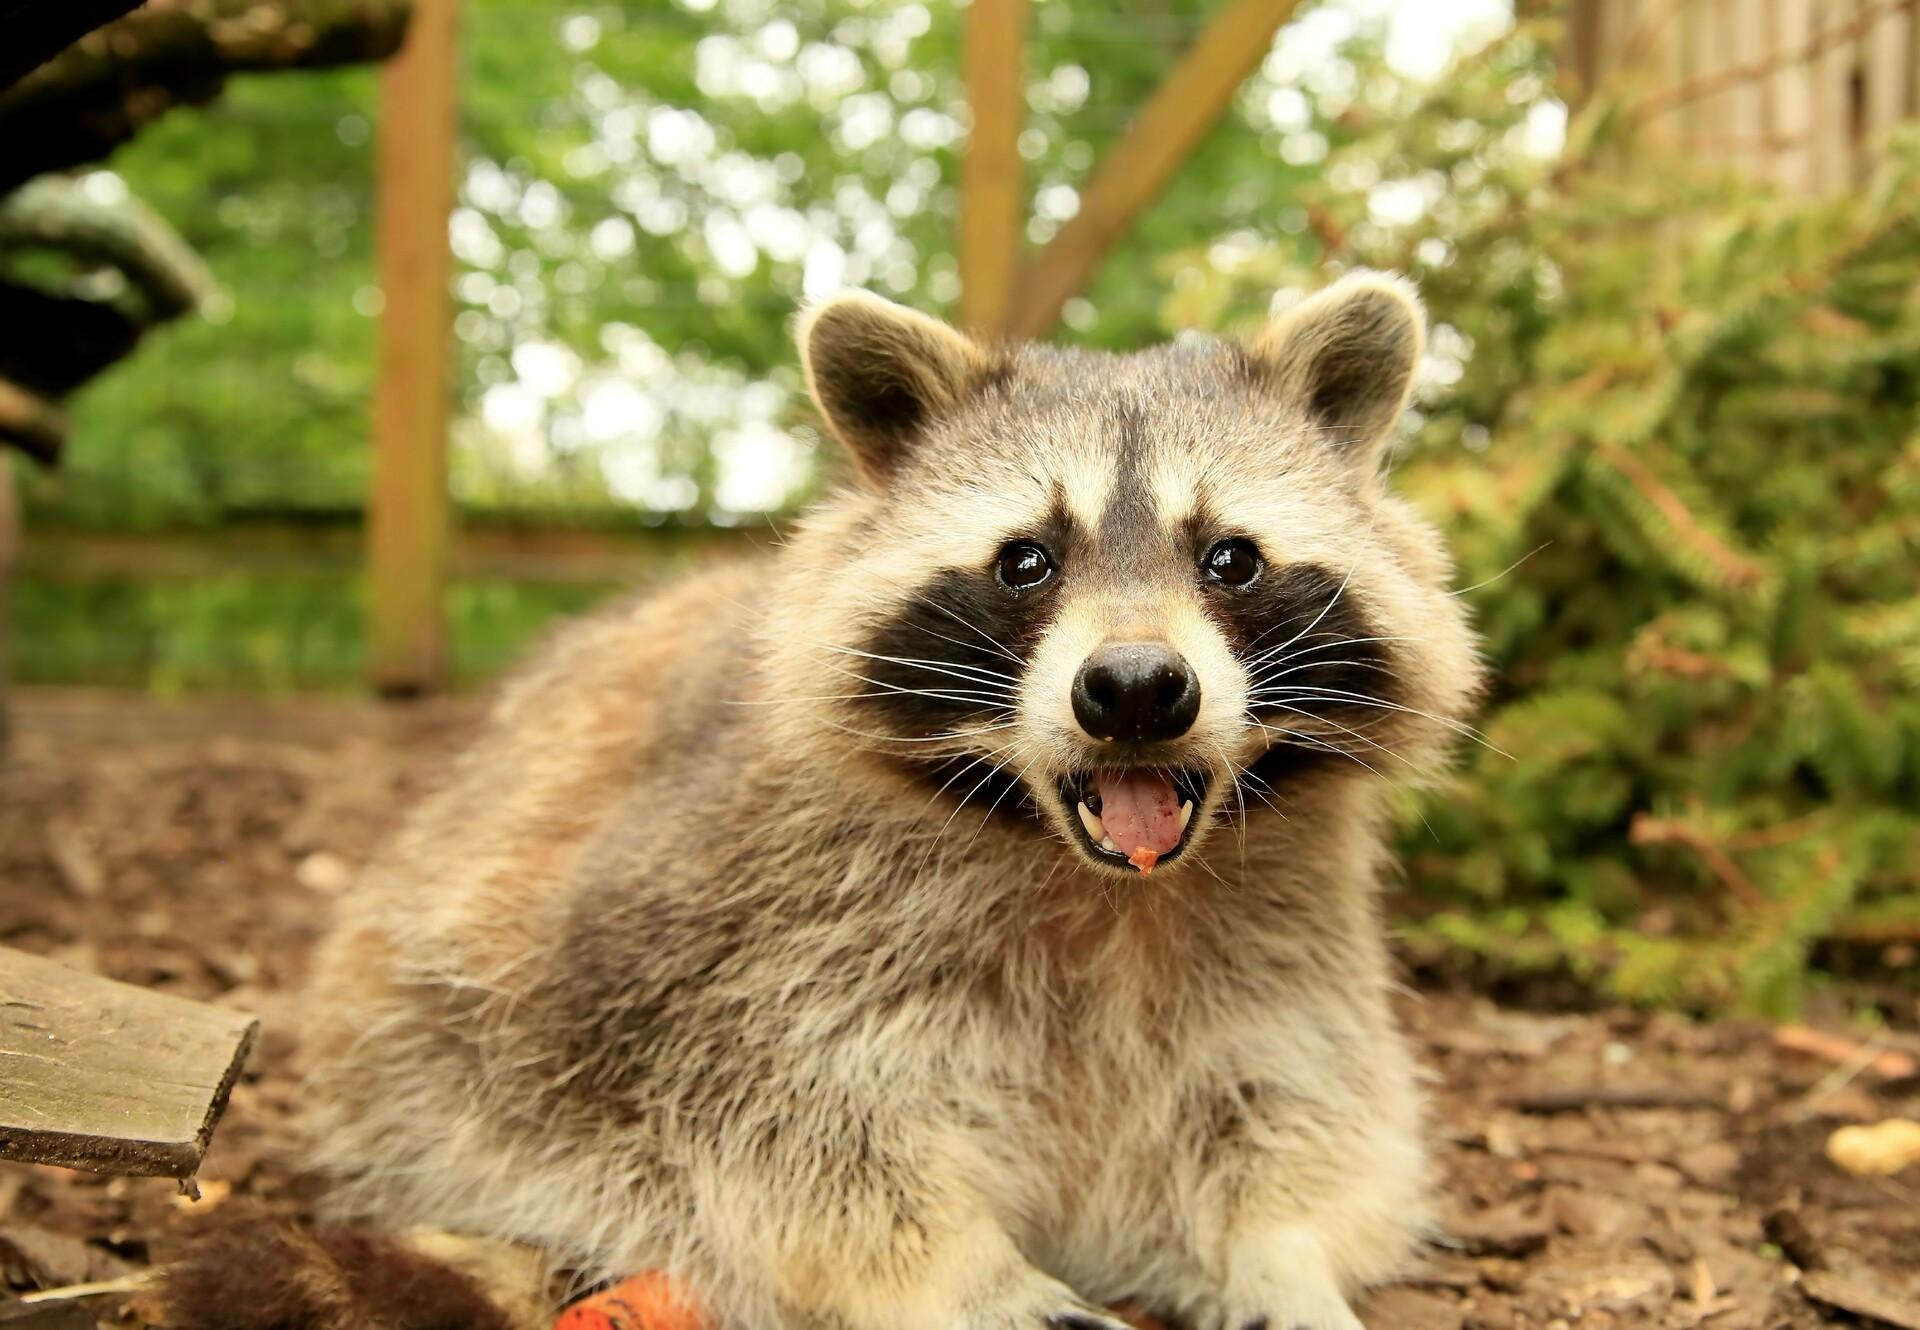 Raccoon at TIERART